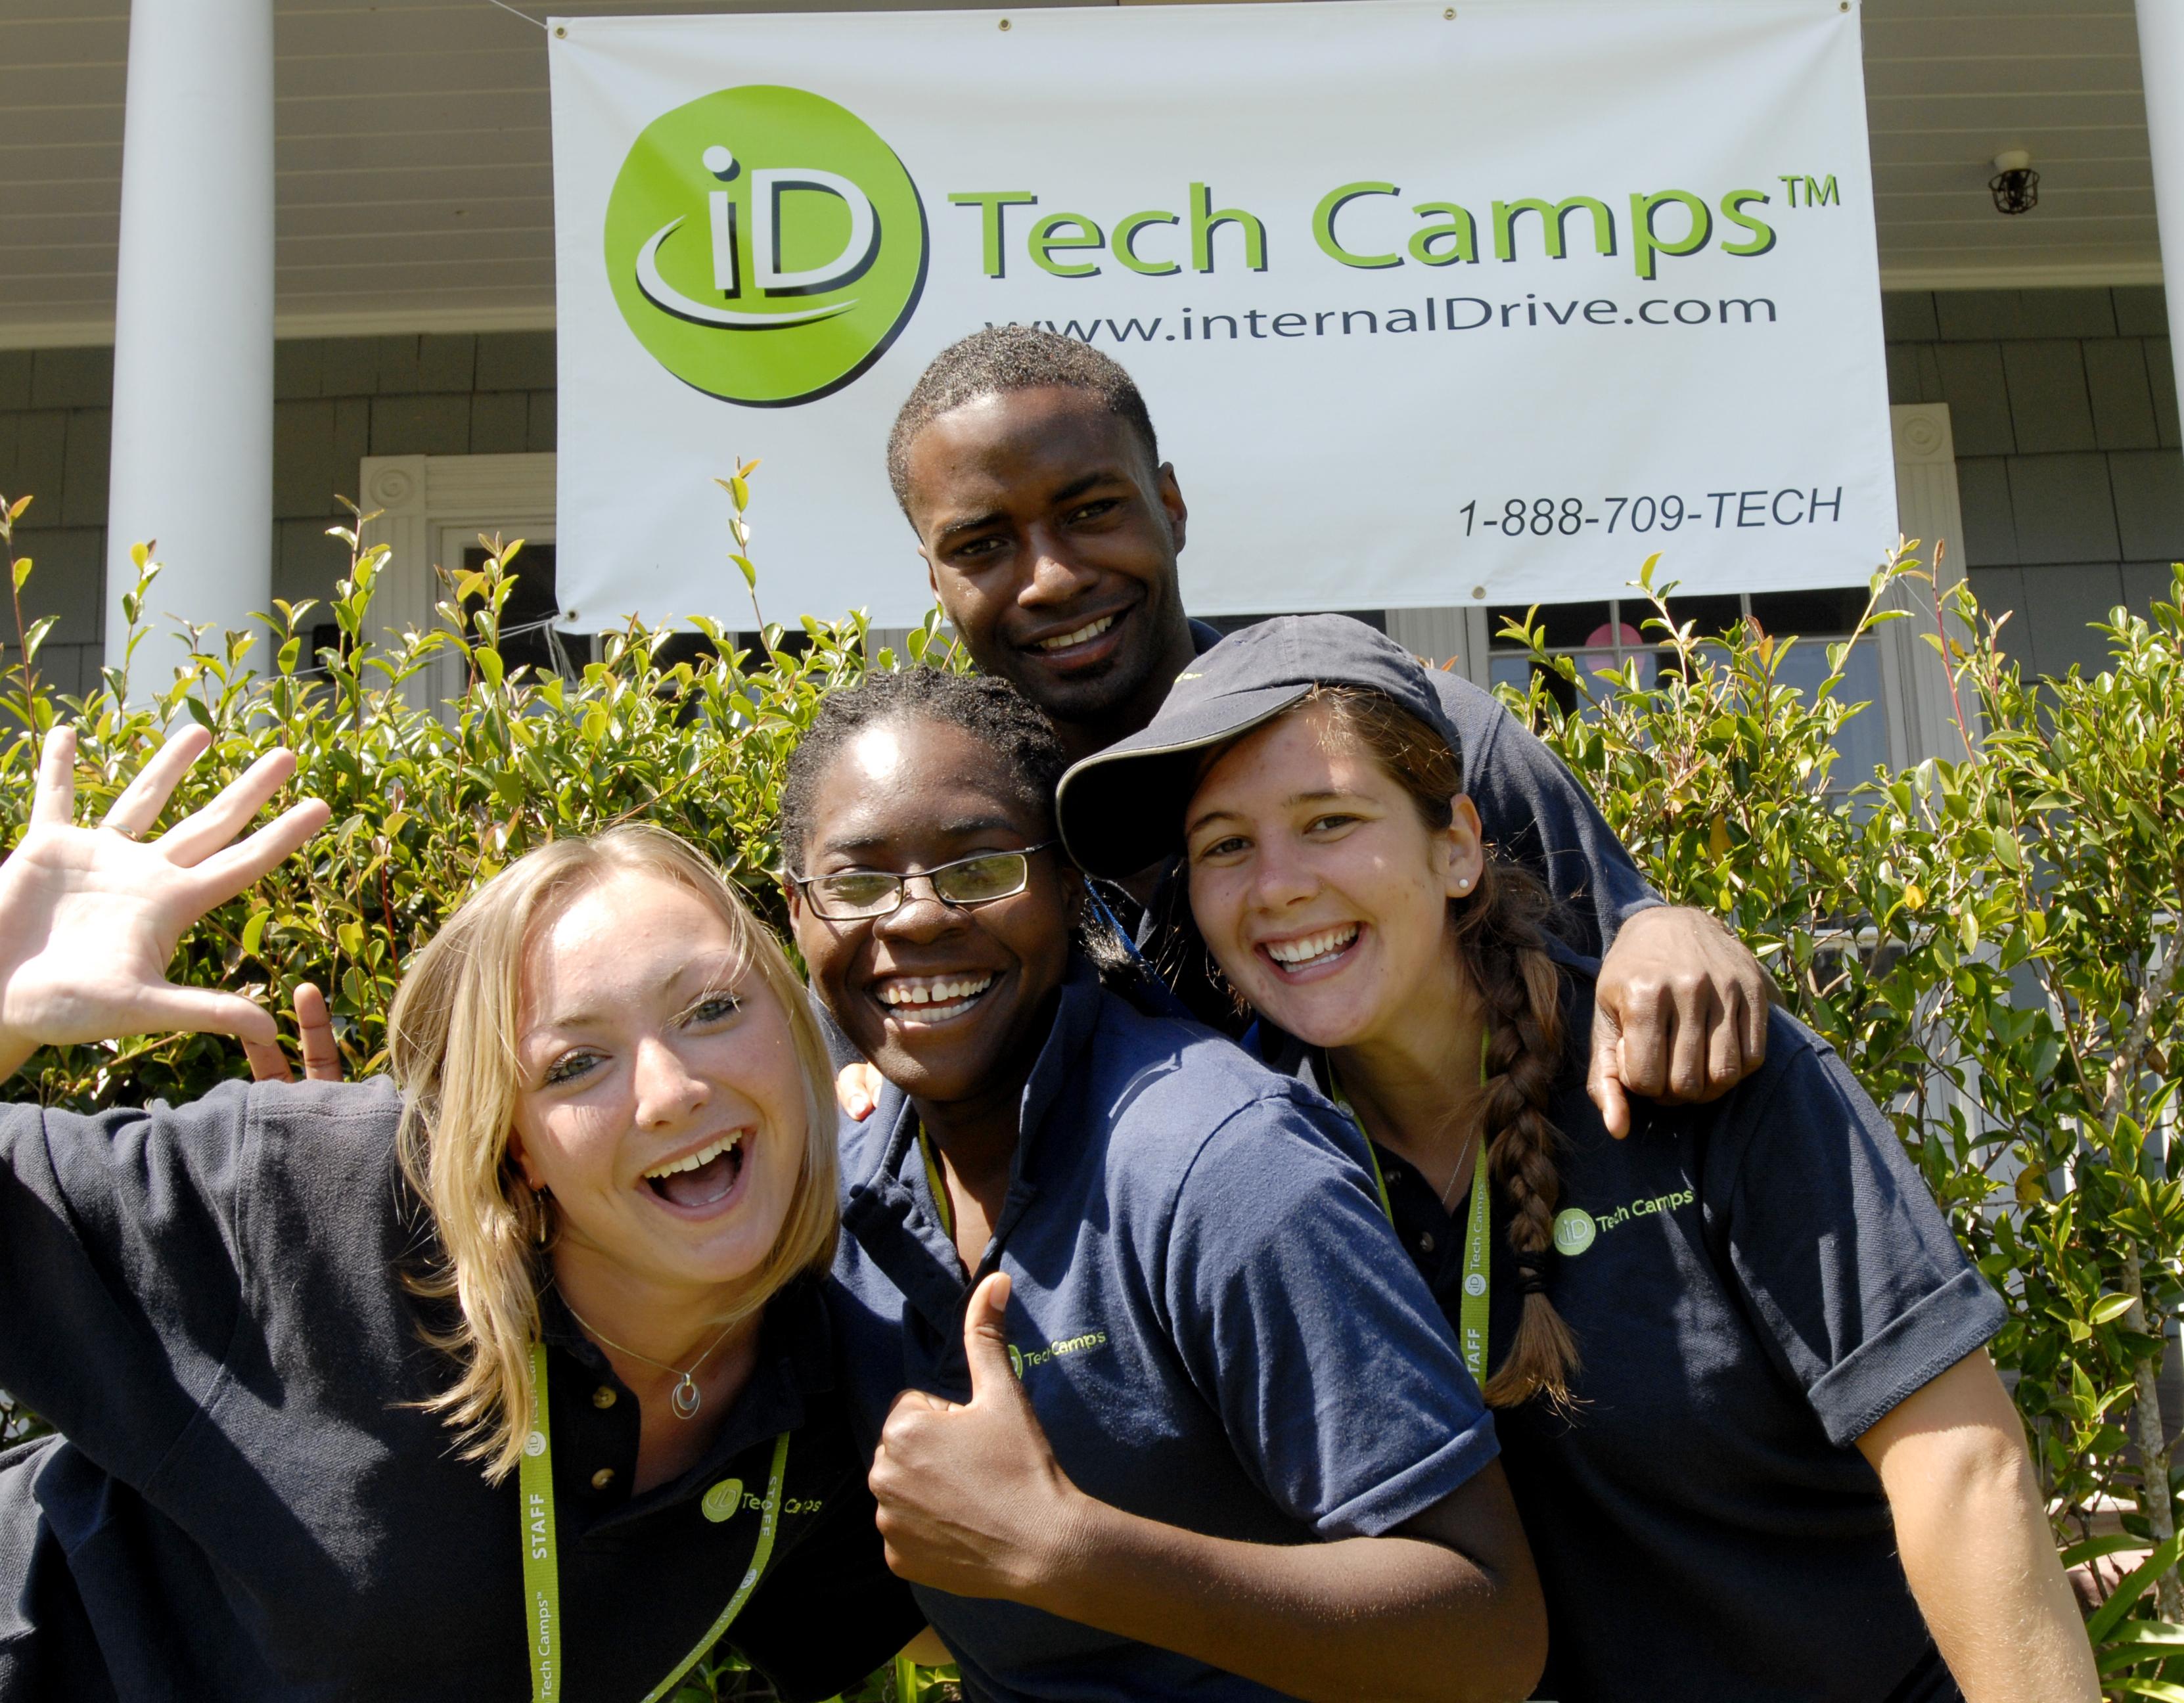 ID Summer Camp Staff Retention: 65 Percent!